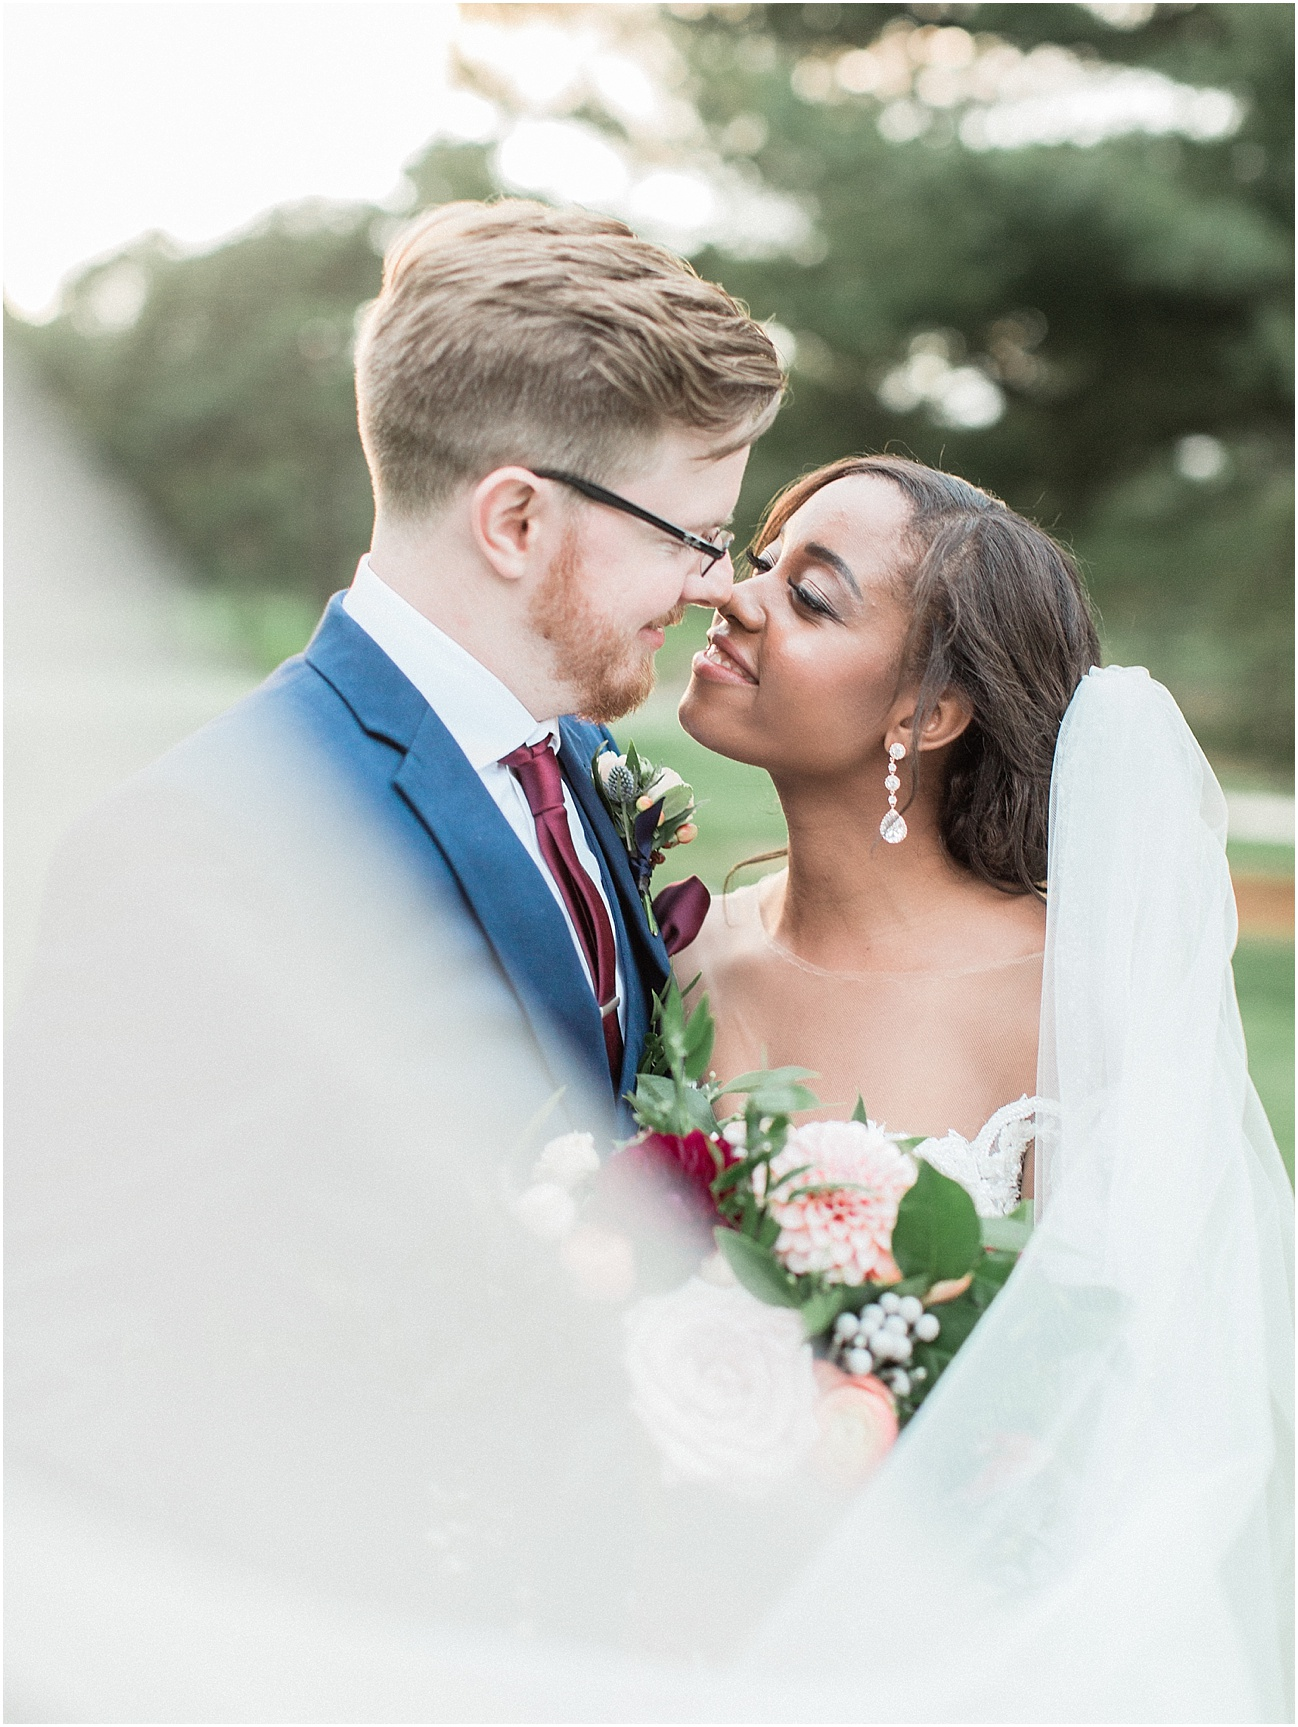 melissa_dan_the_pavilion_at_pine_hills_fall_wine_cape_cod_boston_wedding_photographer_meredith_jane_photography_photo_1207.jpg